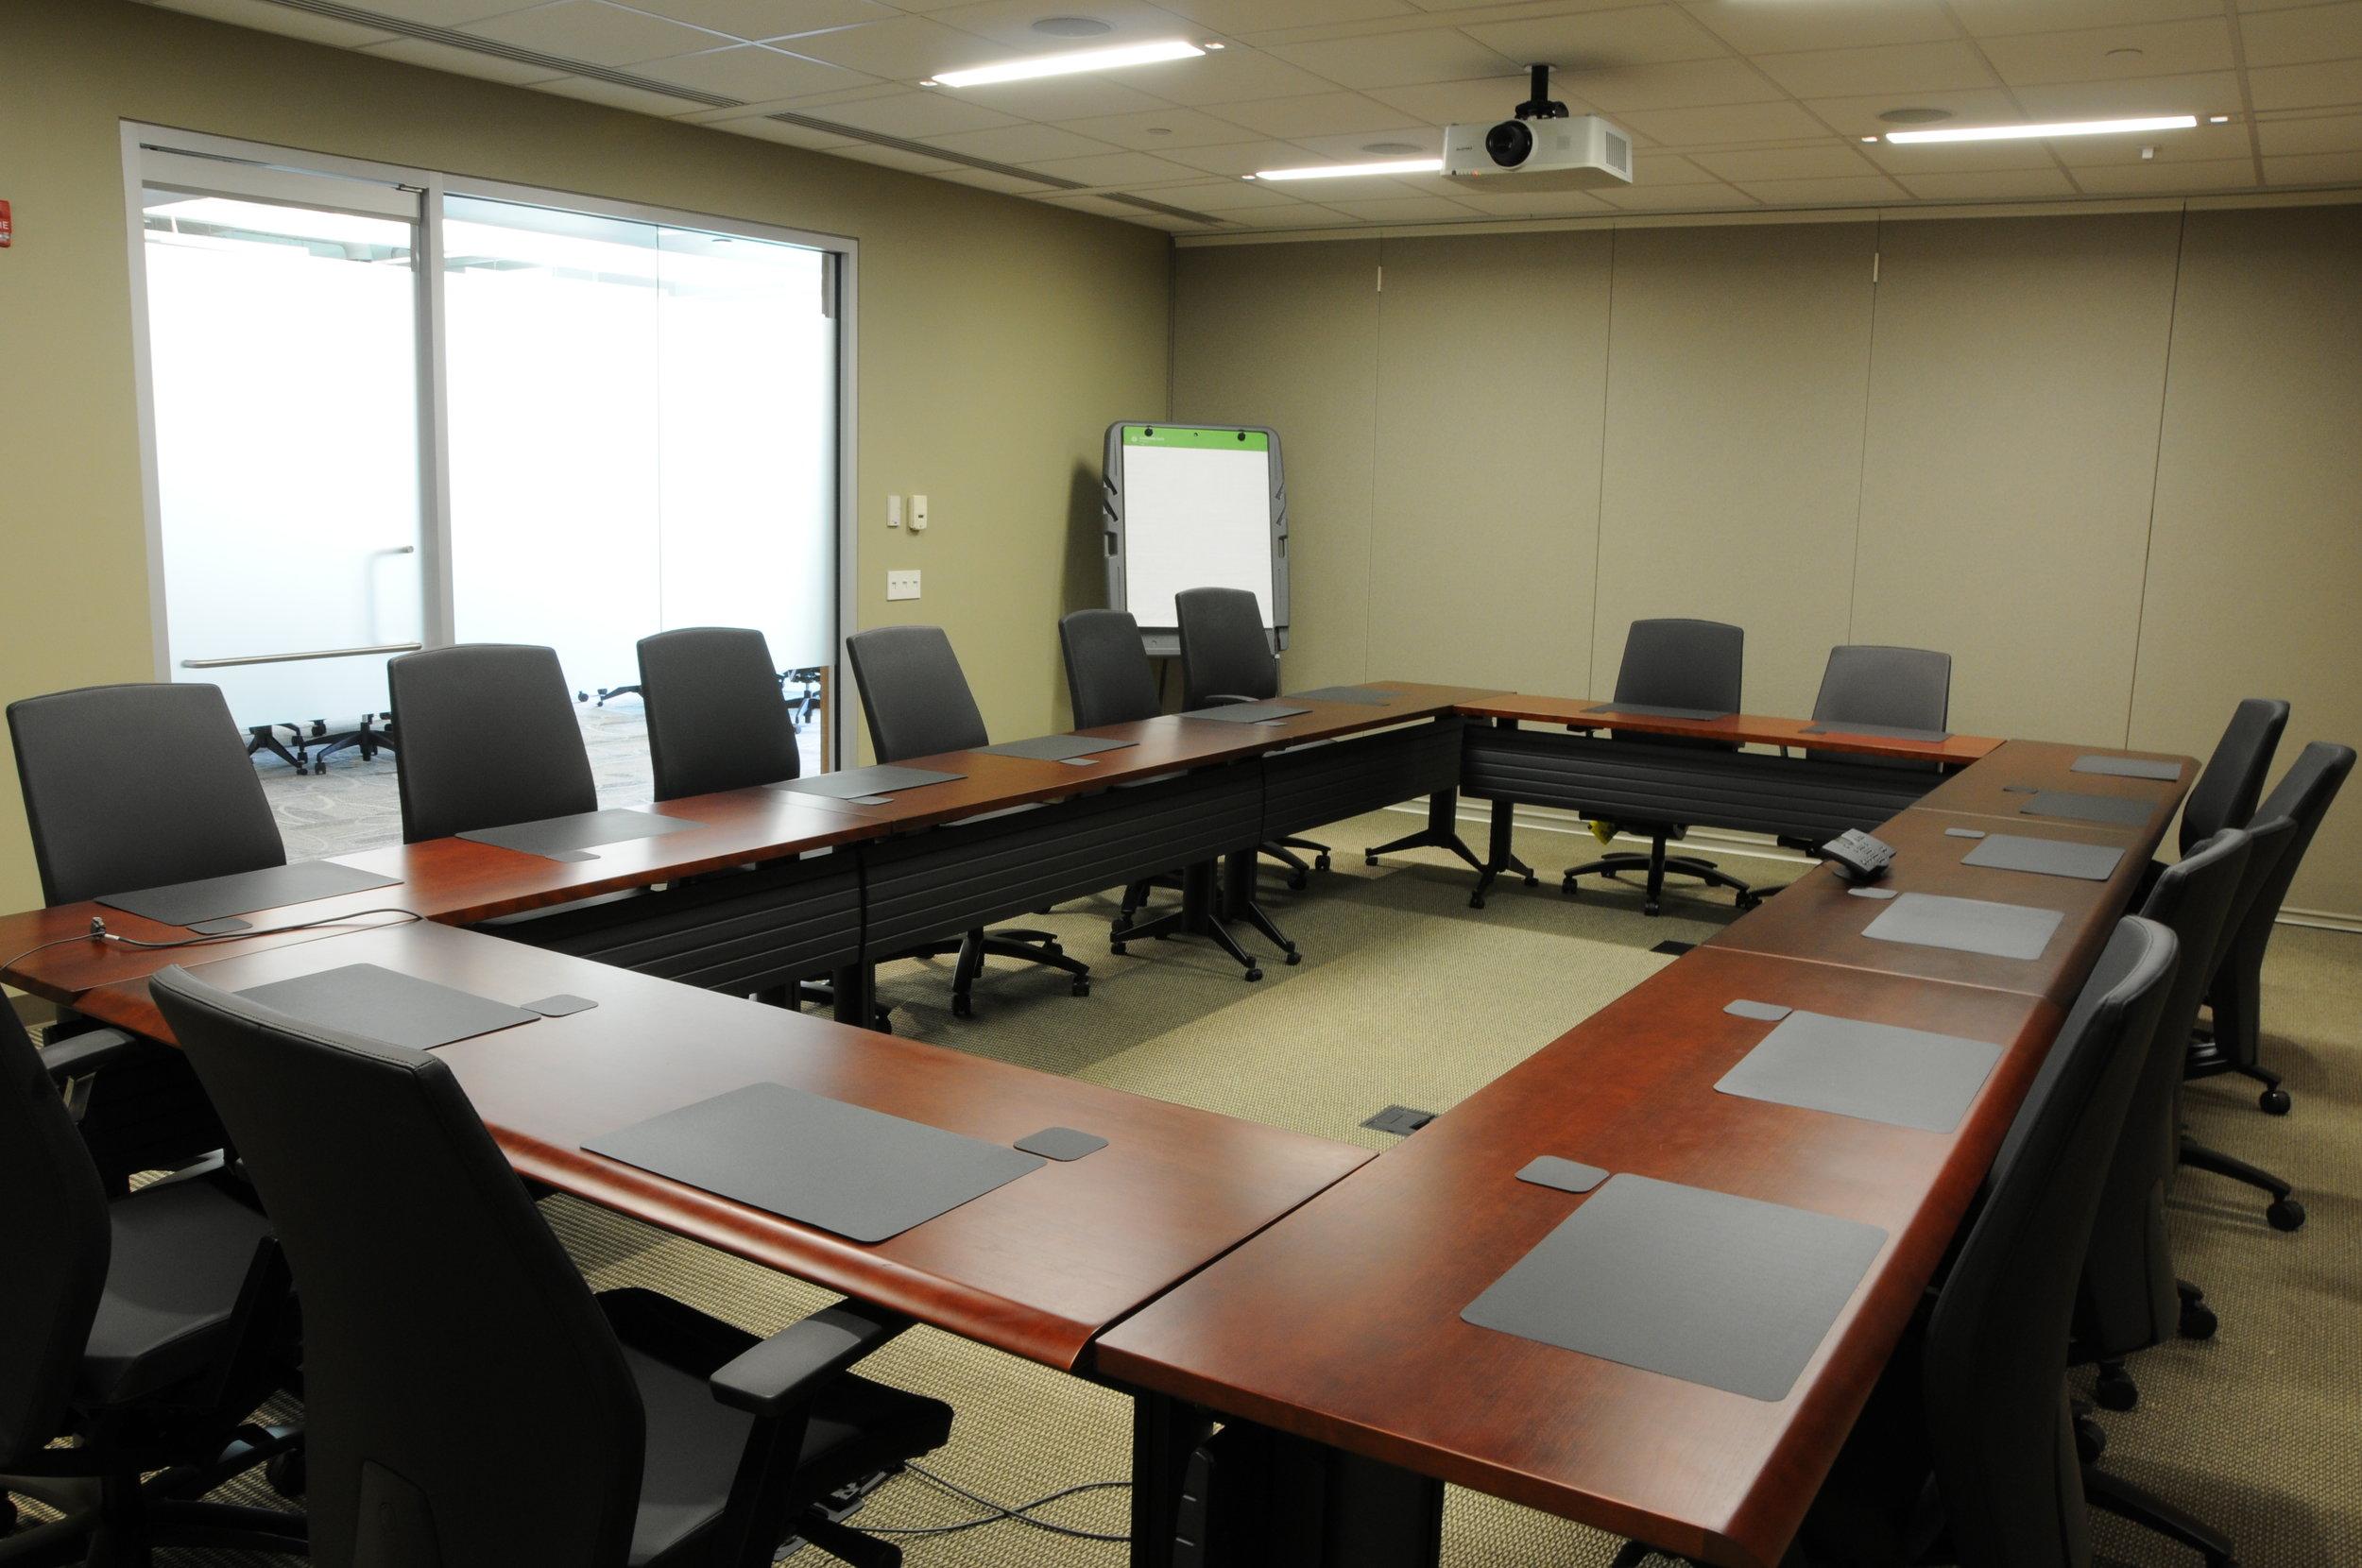 morphotek office lab 091611 (50).JPG